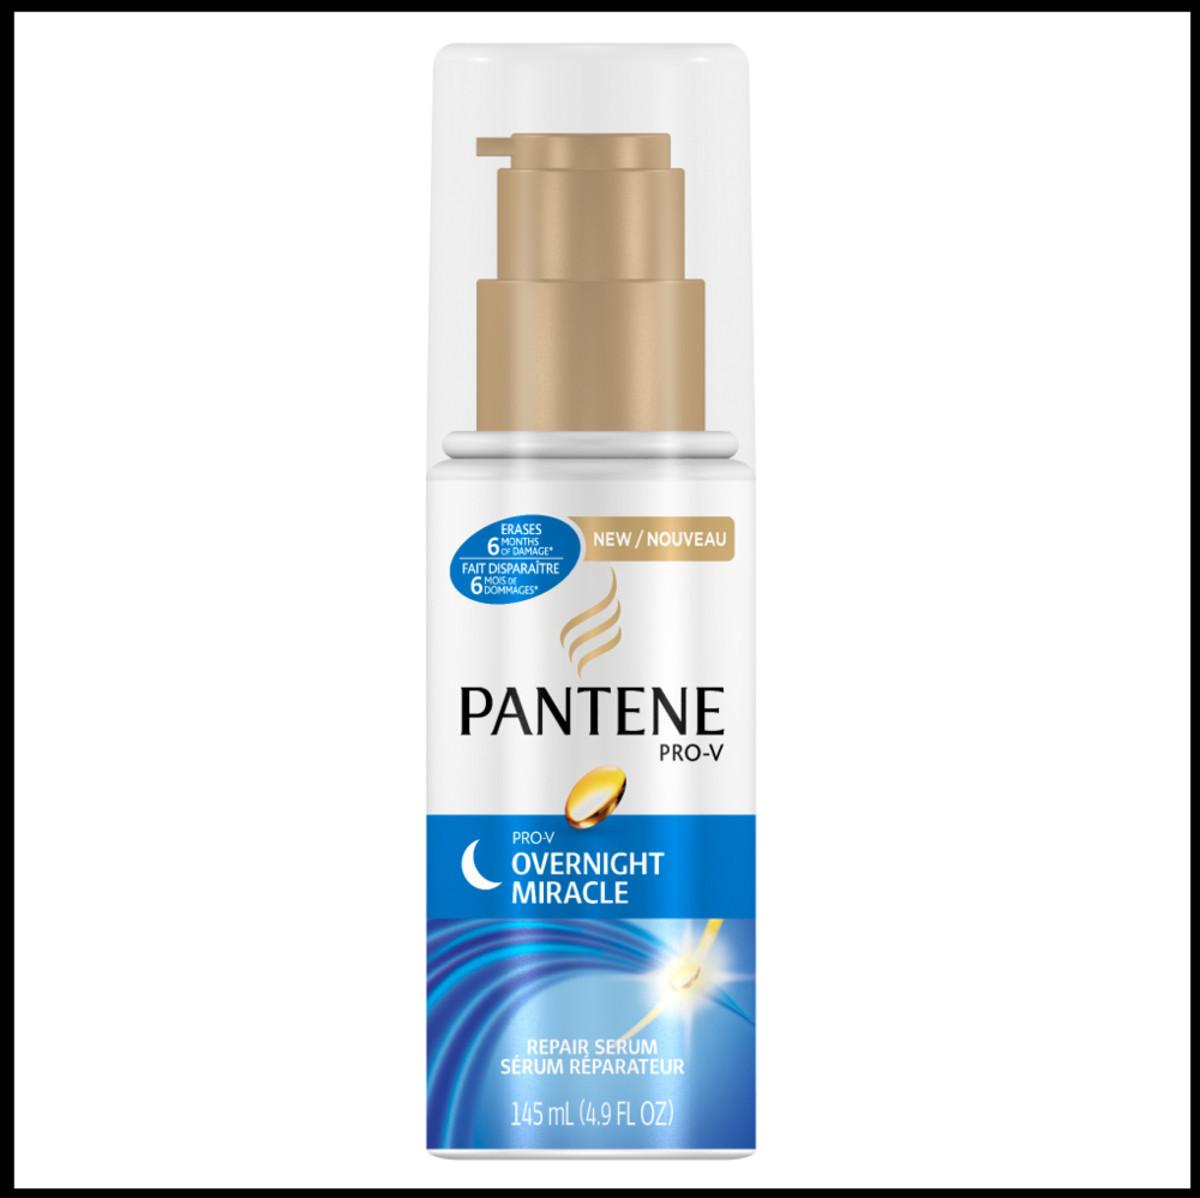 Pantene Overnight Miracle